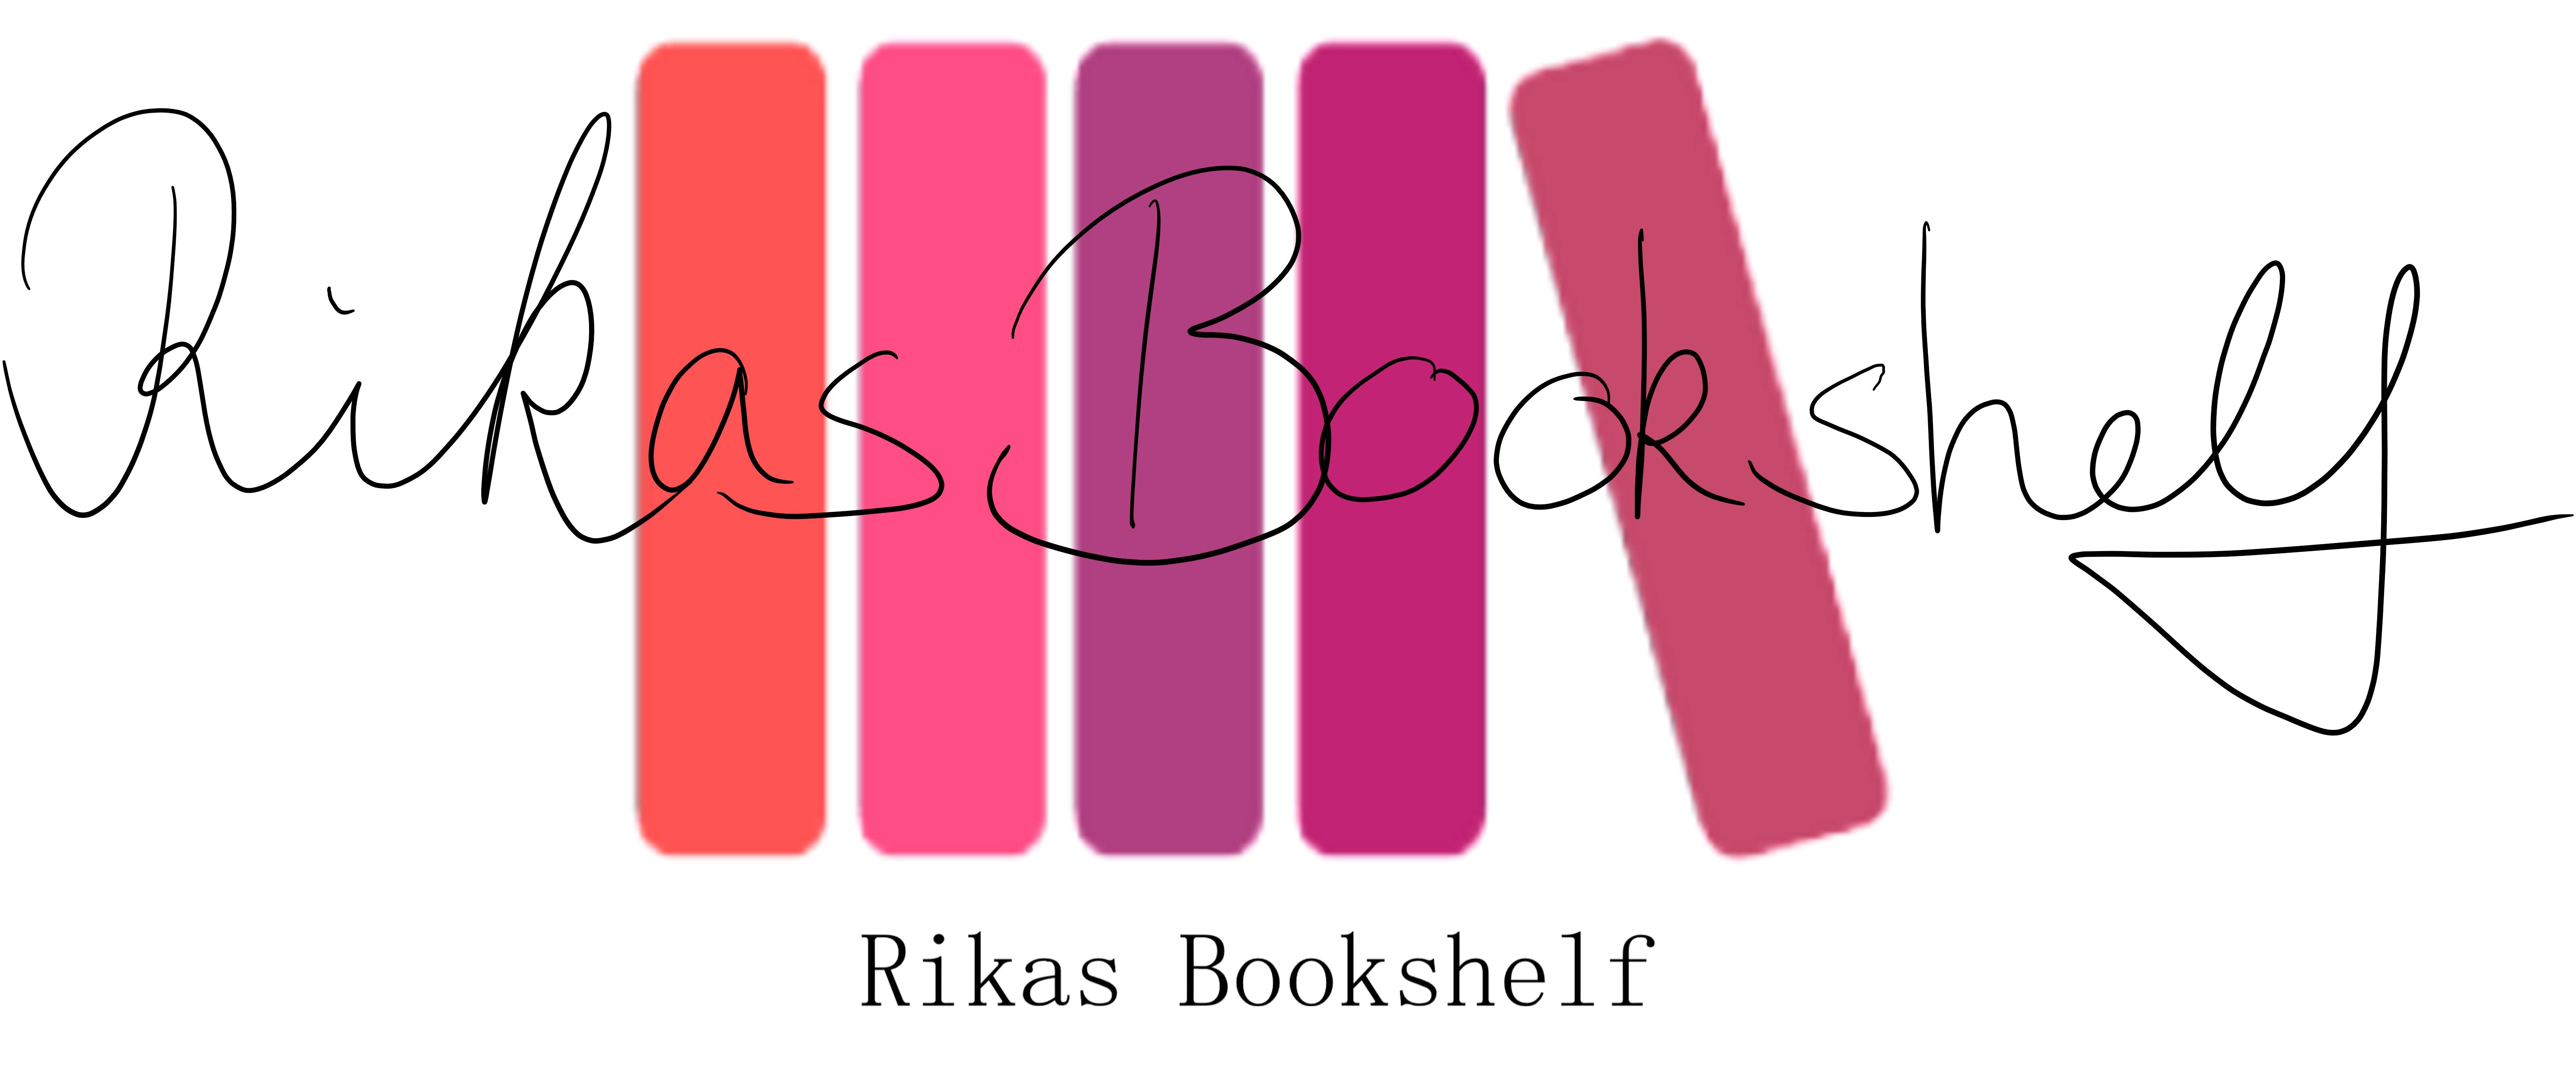 Rikas Bookshelf